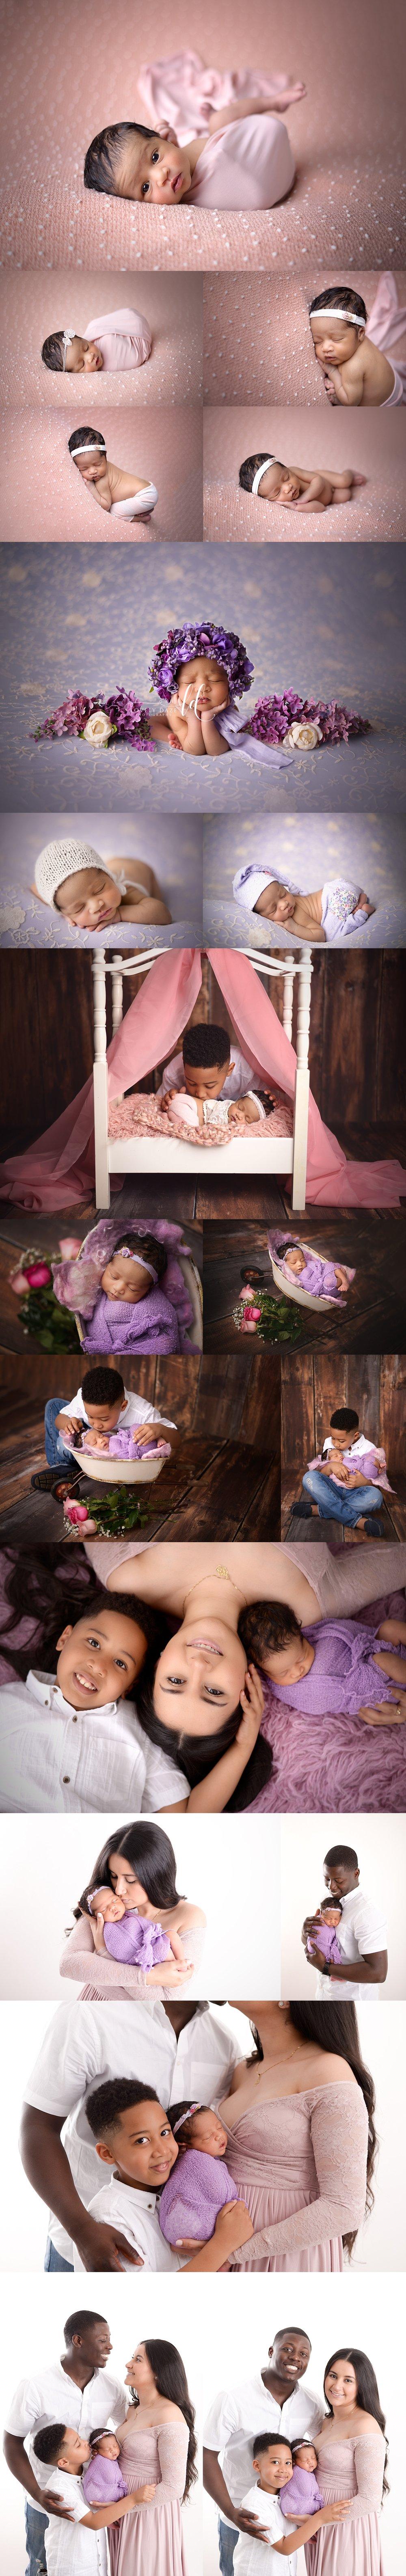 nj newborn photographer baby girl pink purple flowers